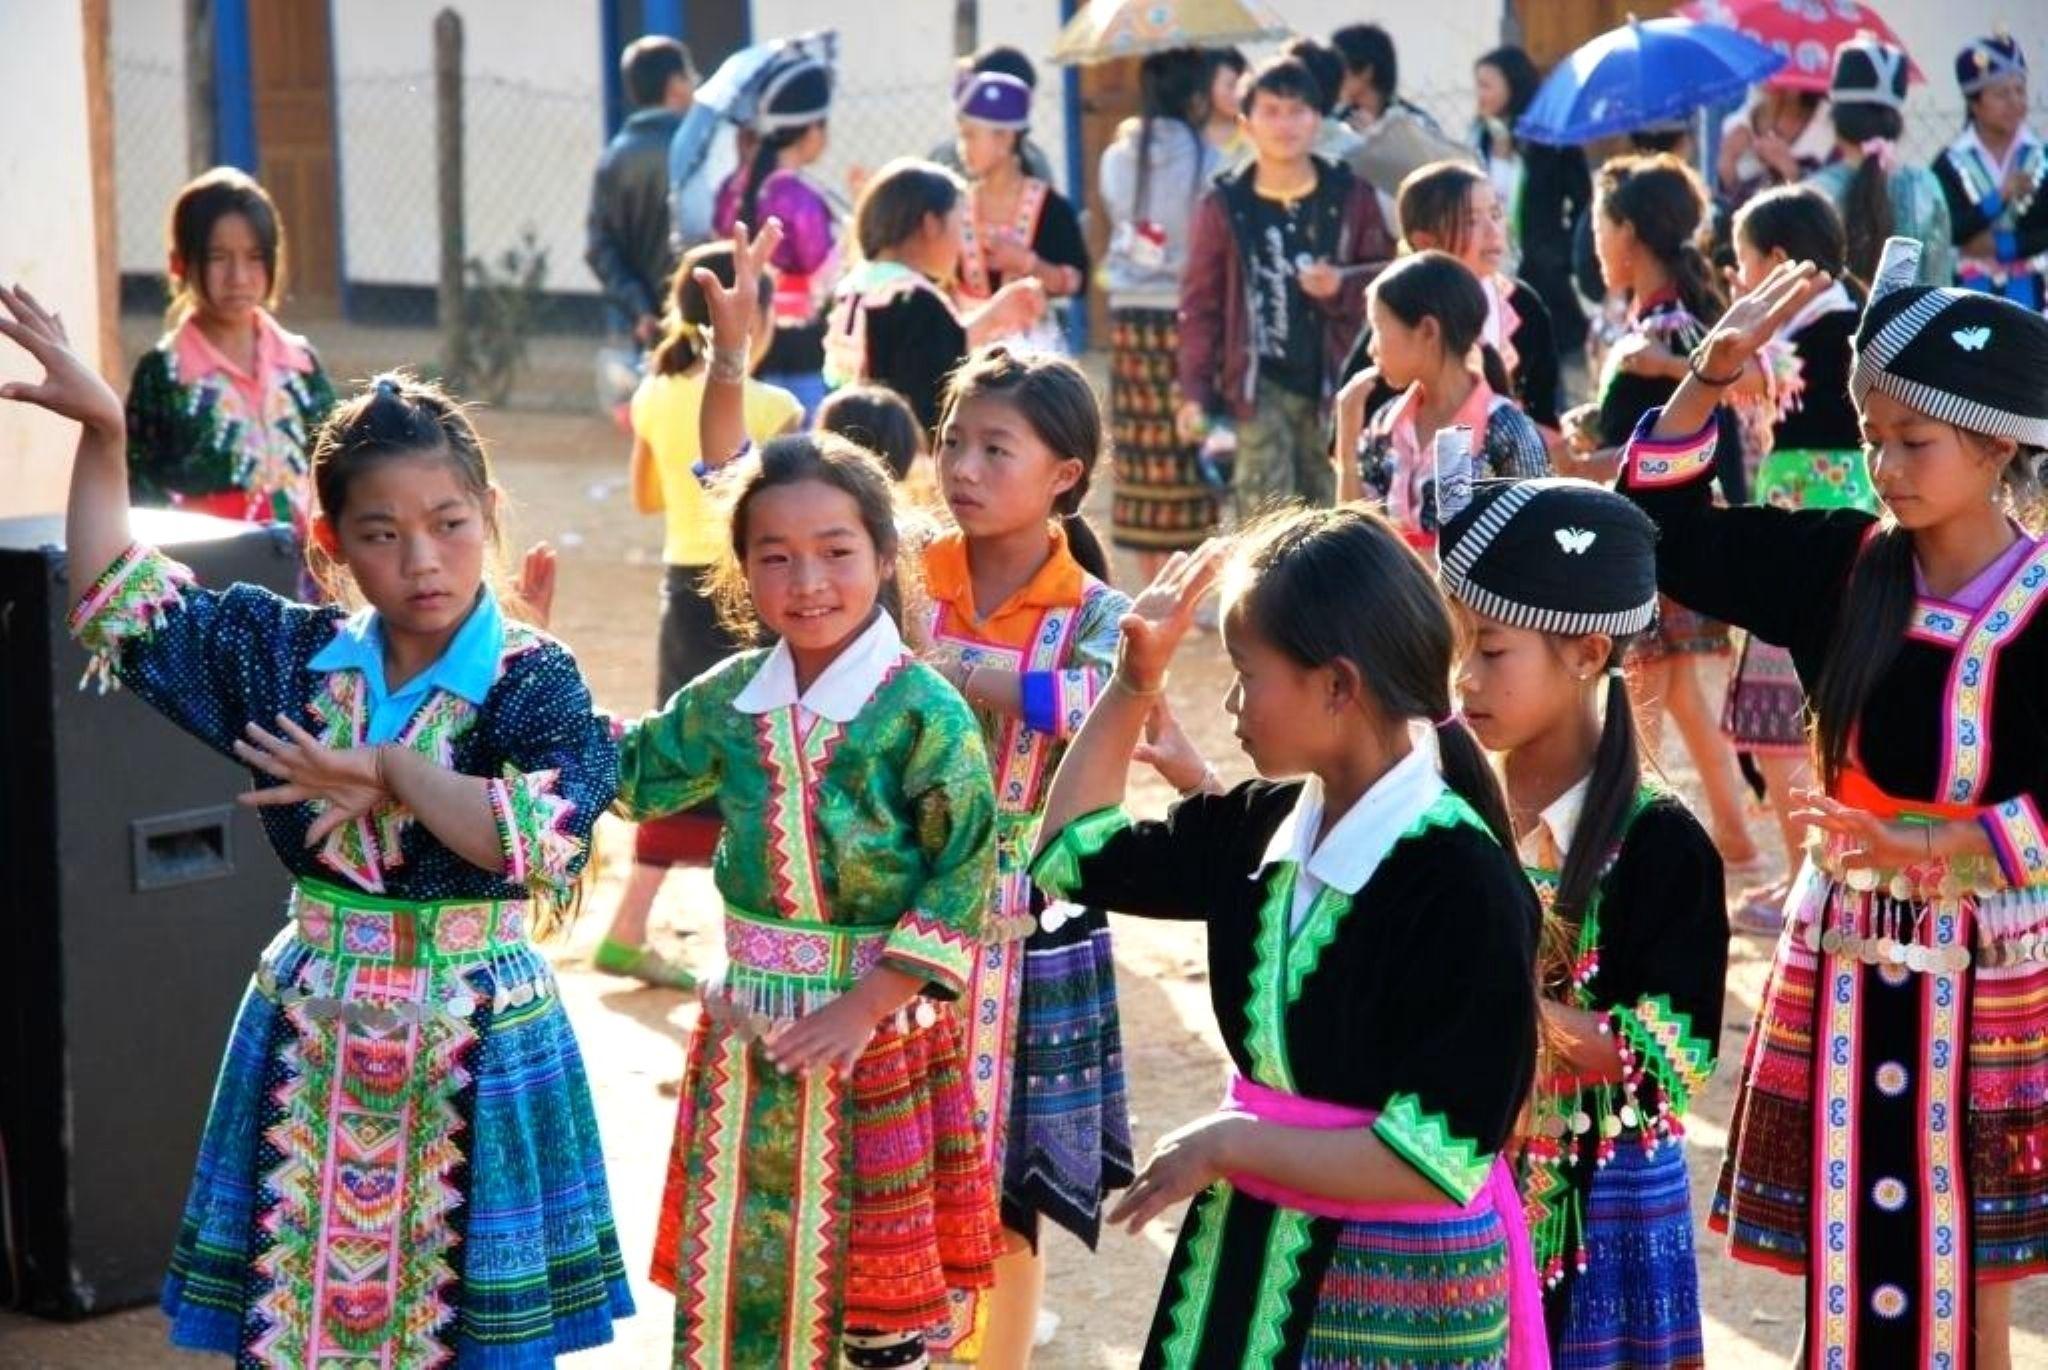 Laos by frankska63